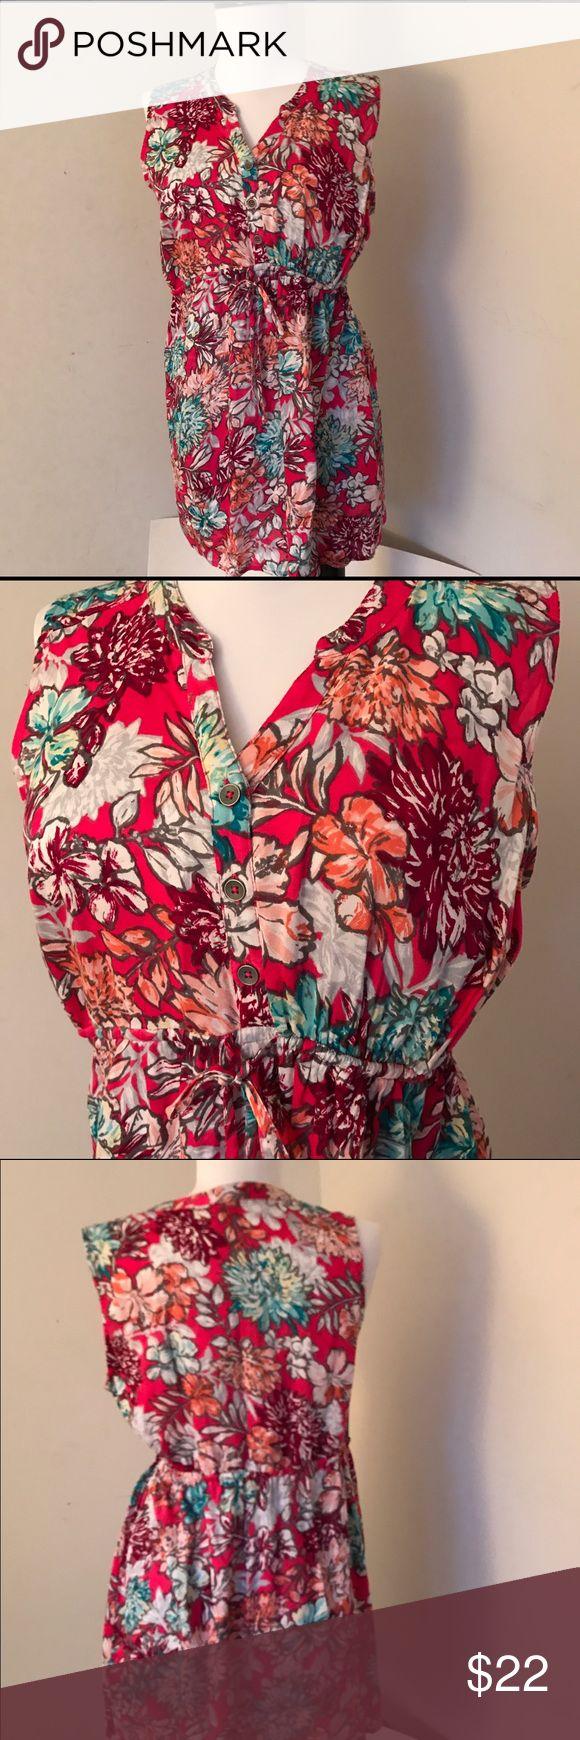 NWT maternity top Oh Baby Motherhood Sleeveless, elastic drawstring waist. Vneckline. 3 buttons. 100% rayon Oh Baby by Motherhood Tops Tunics